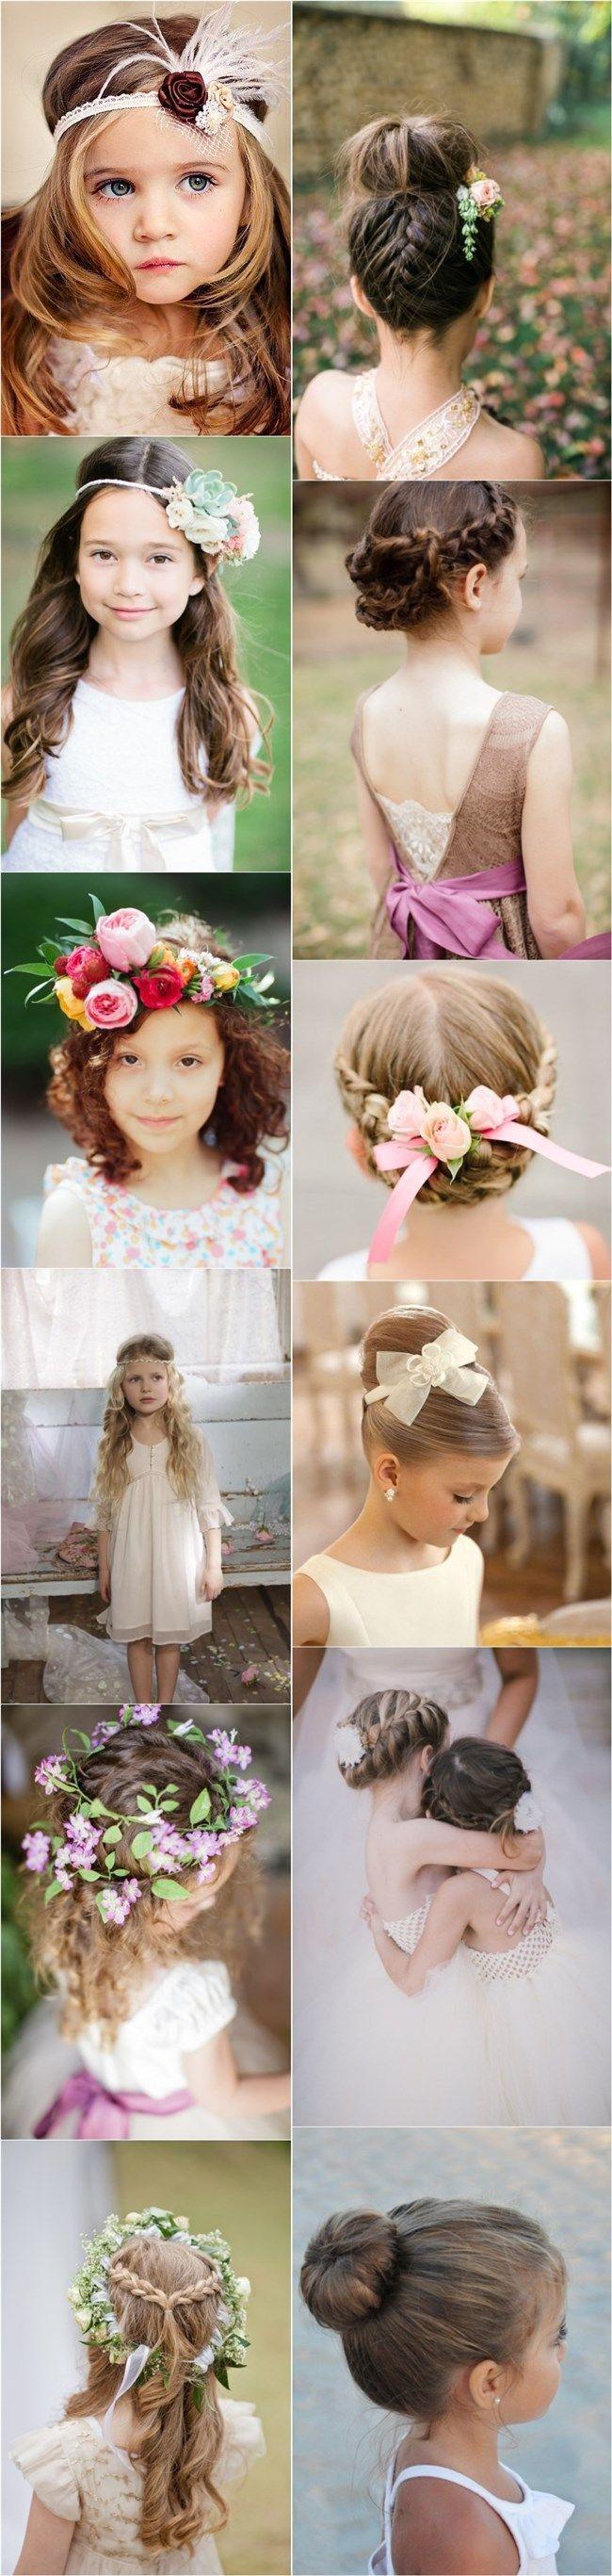 Cute little girl hairstylesupdos braids waterfall autumn